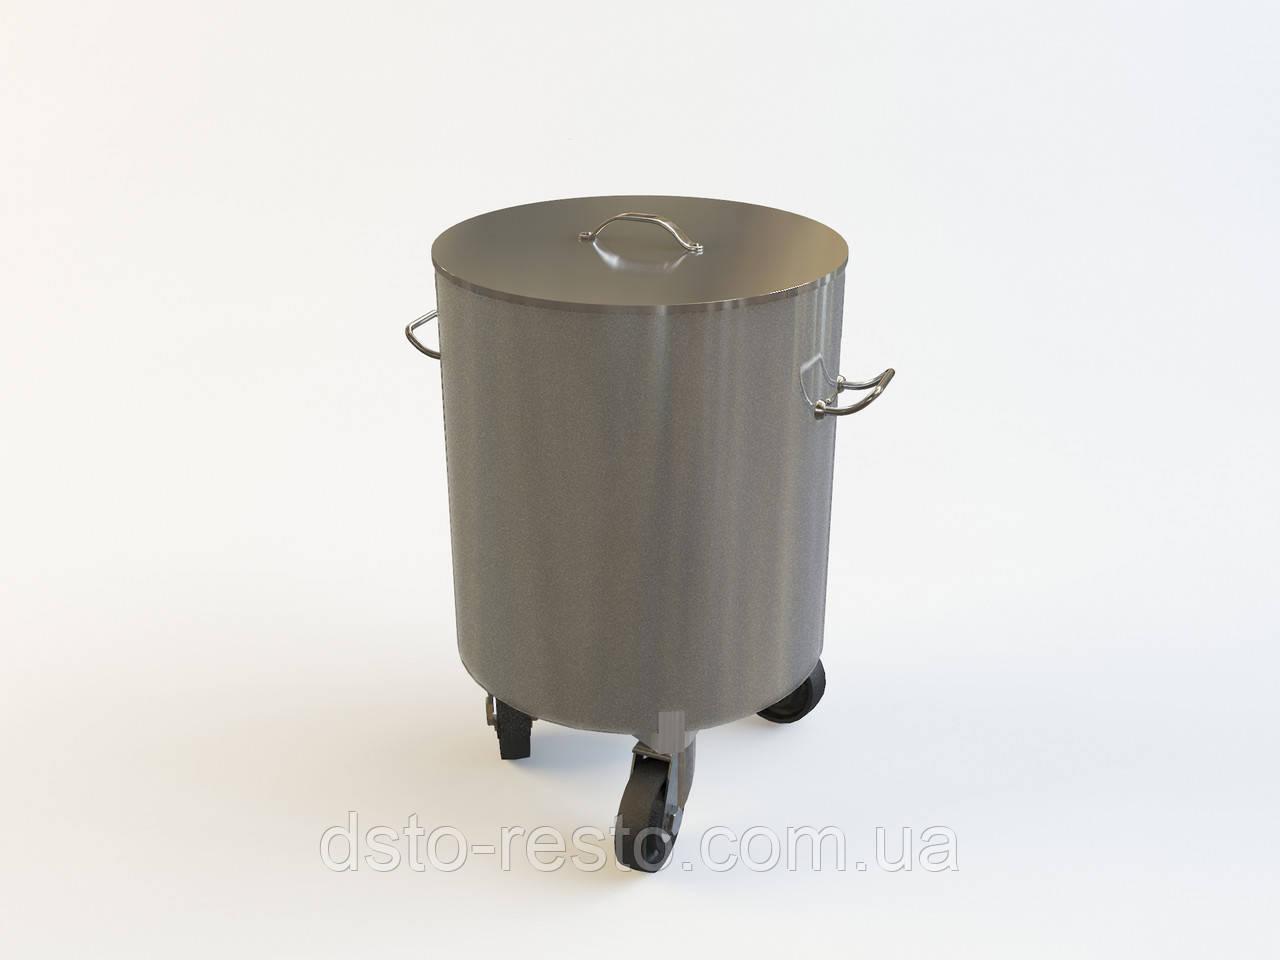 Бак для сбора отходов  на 30 л